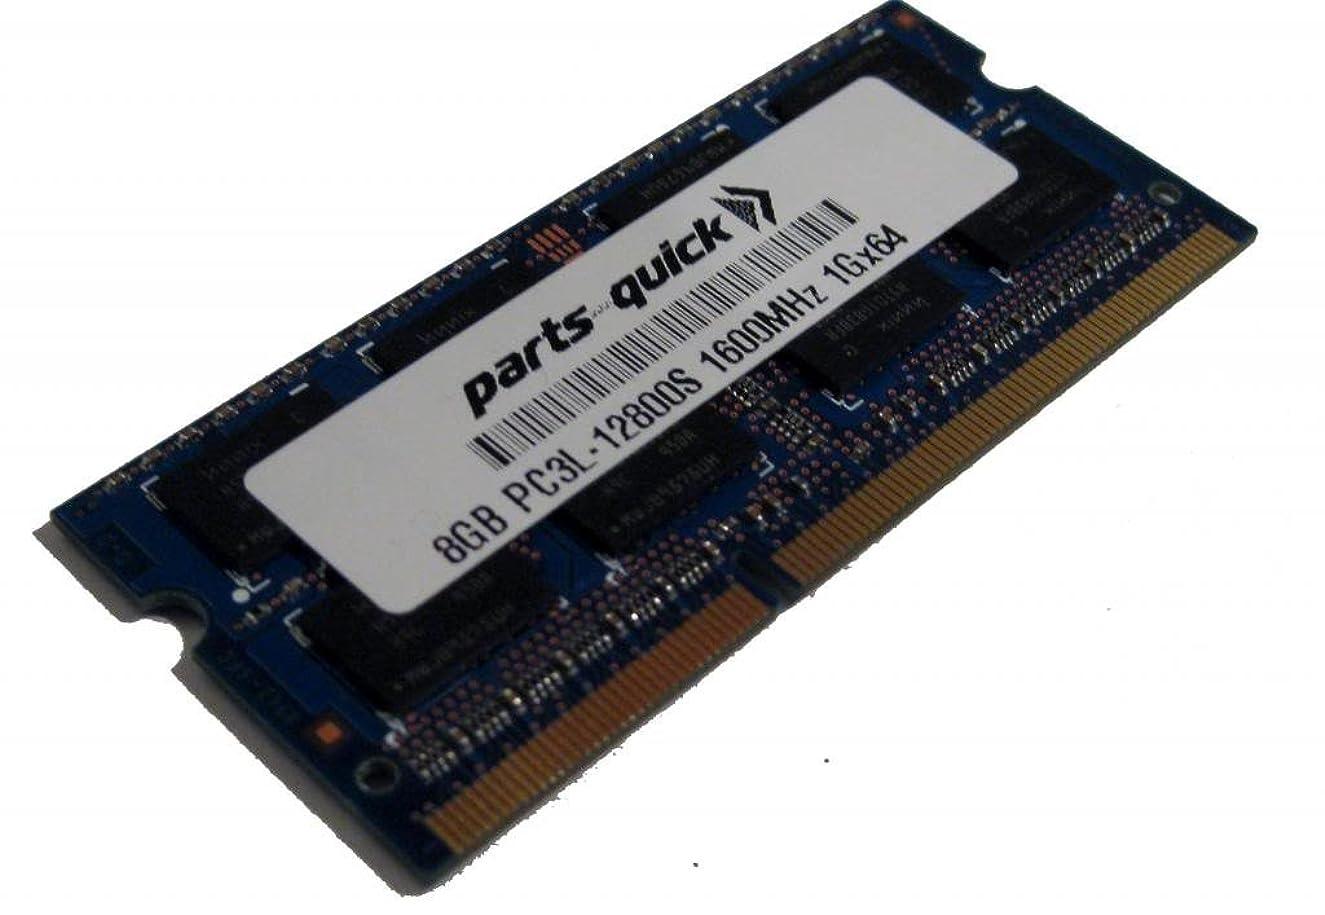 8GB Memory Upgrade for Lenovo ThinkPad T550 DDR3L 1600MHz PC3L-12800 SODIMM RAM (PARTS-QUICK BRAND)